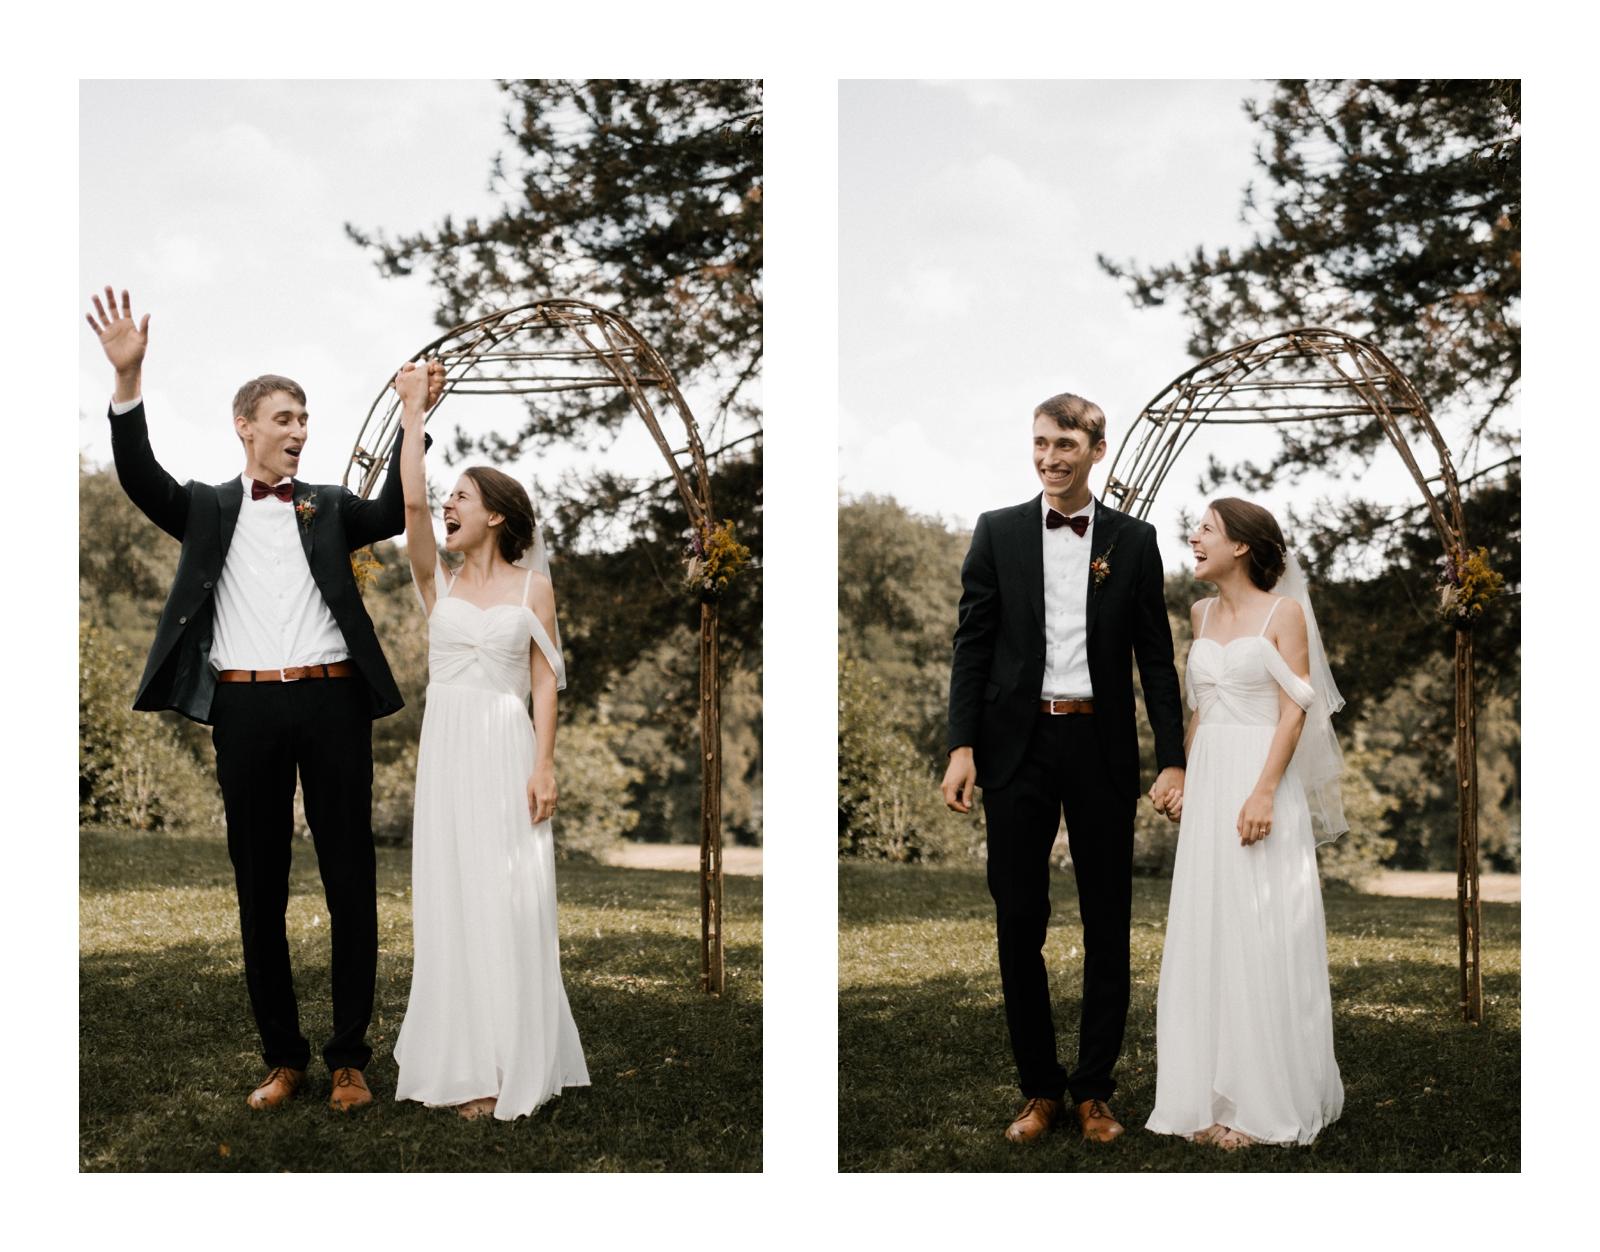 mirjam_thomas_wedding-408.jpg